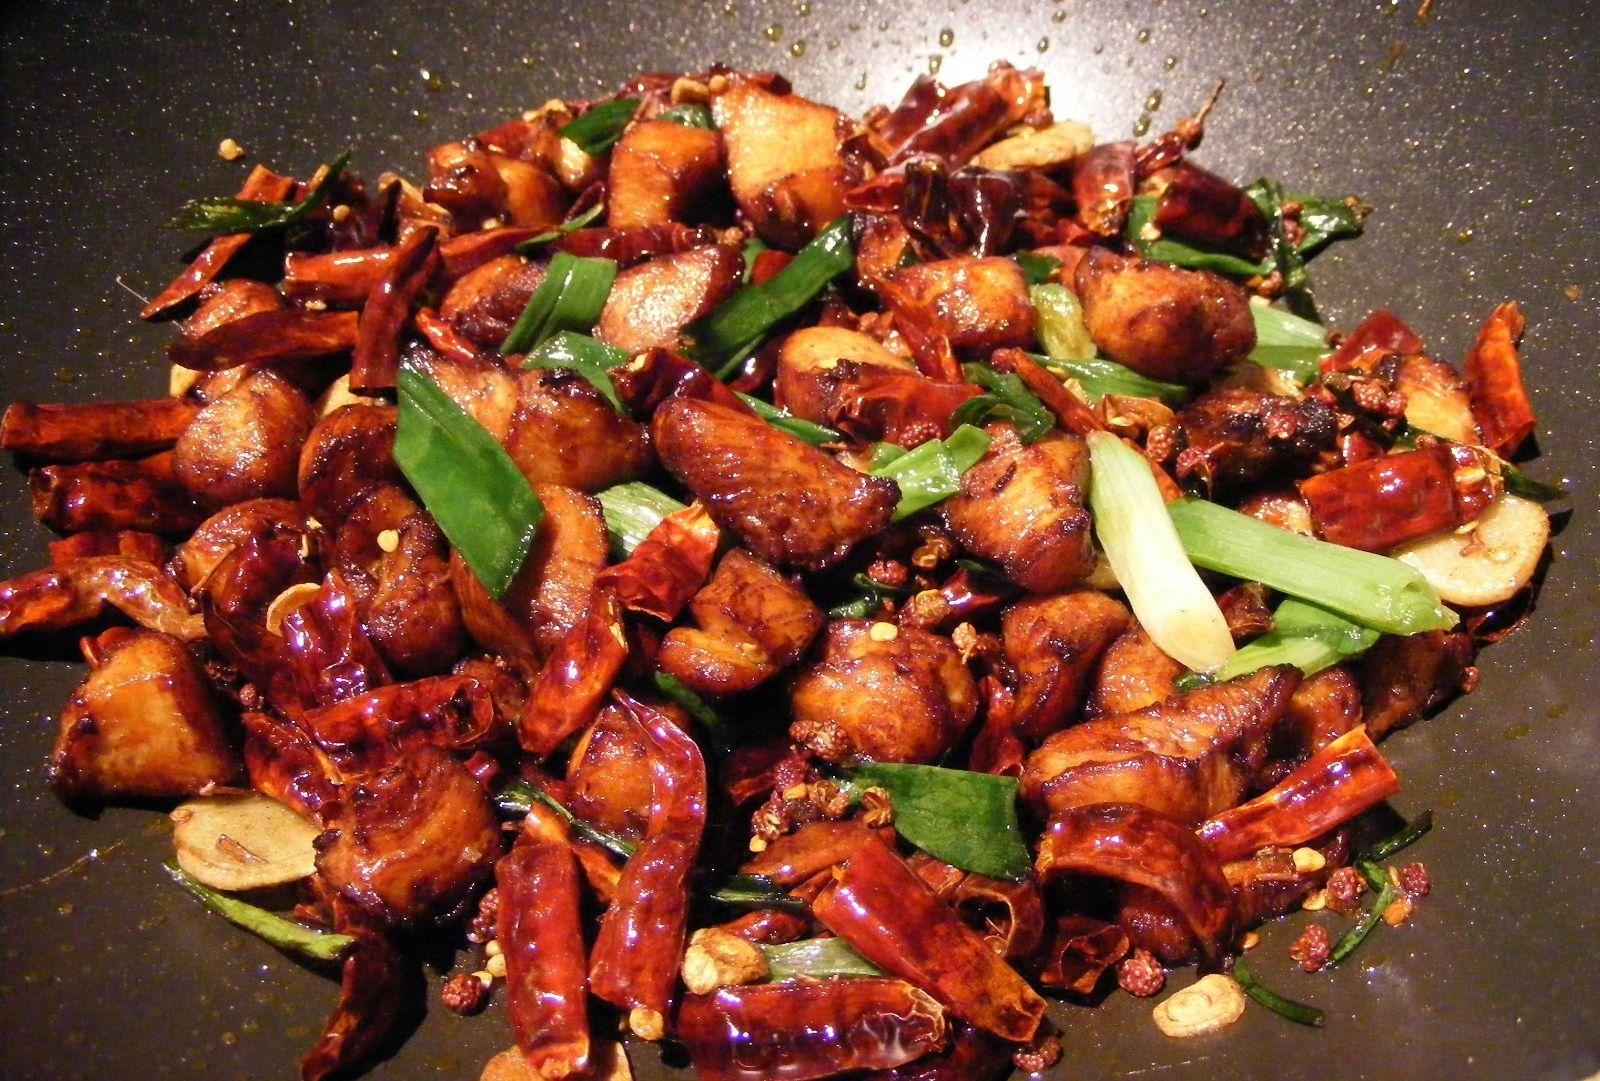 Carne frita con chile: Carta de DANI LIU